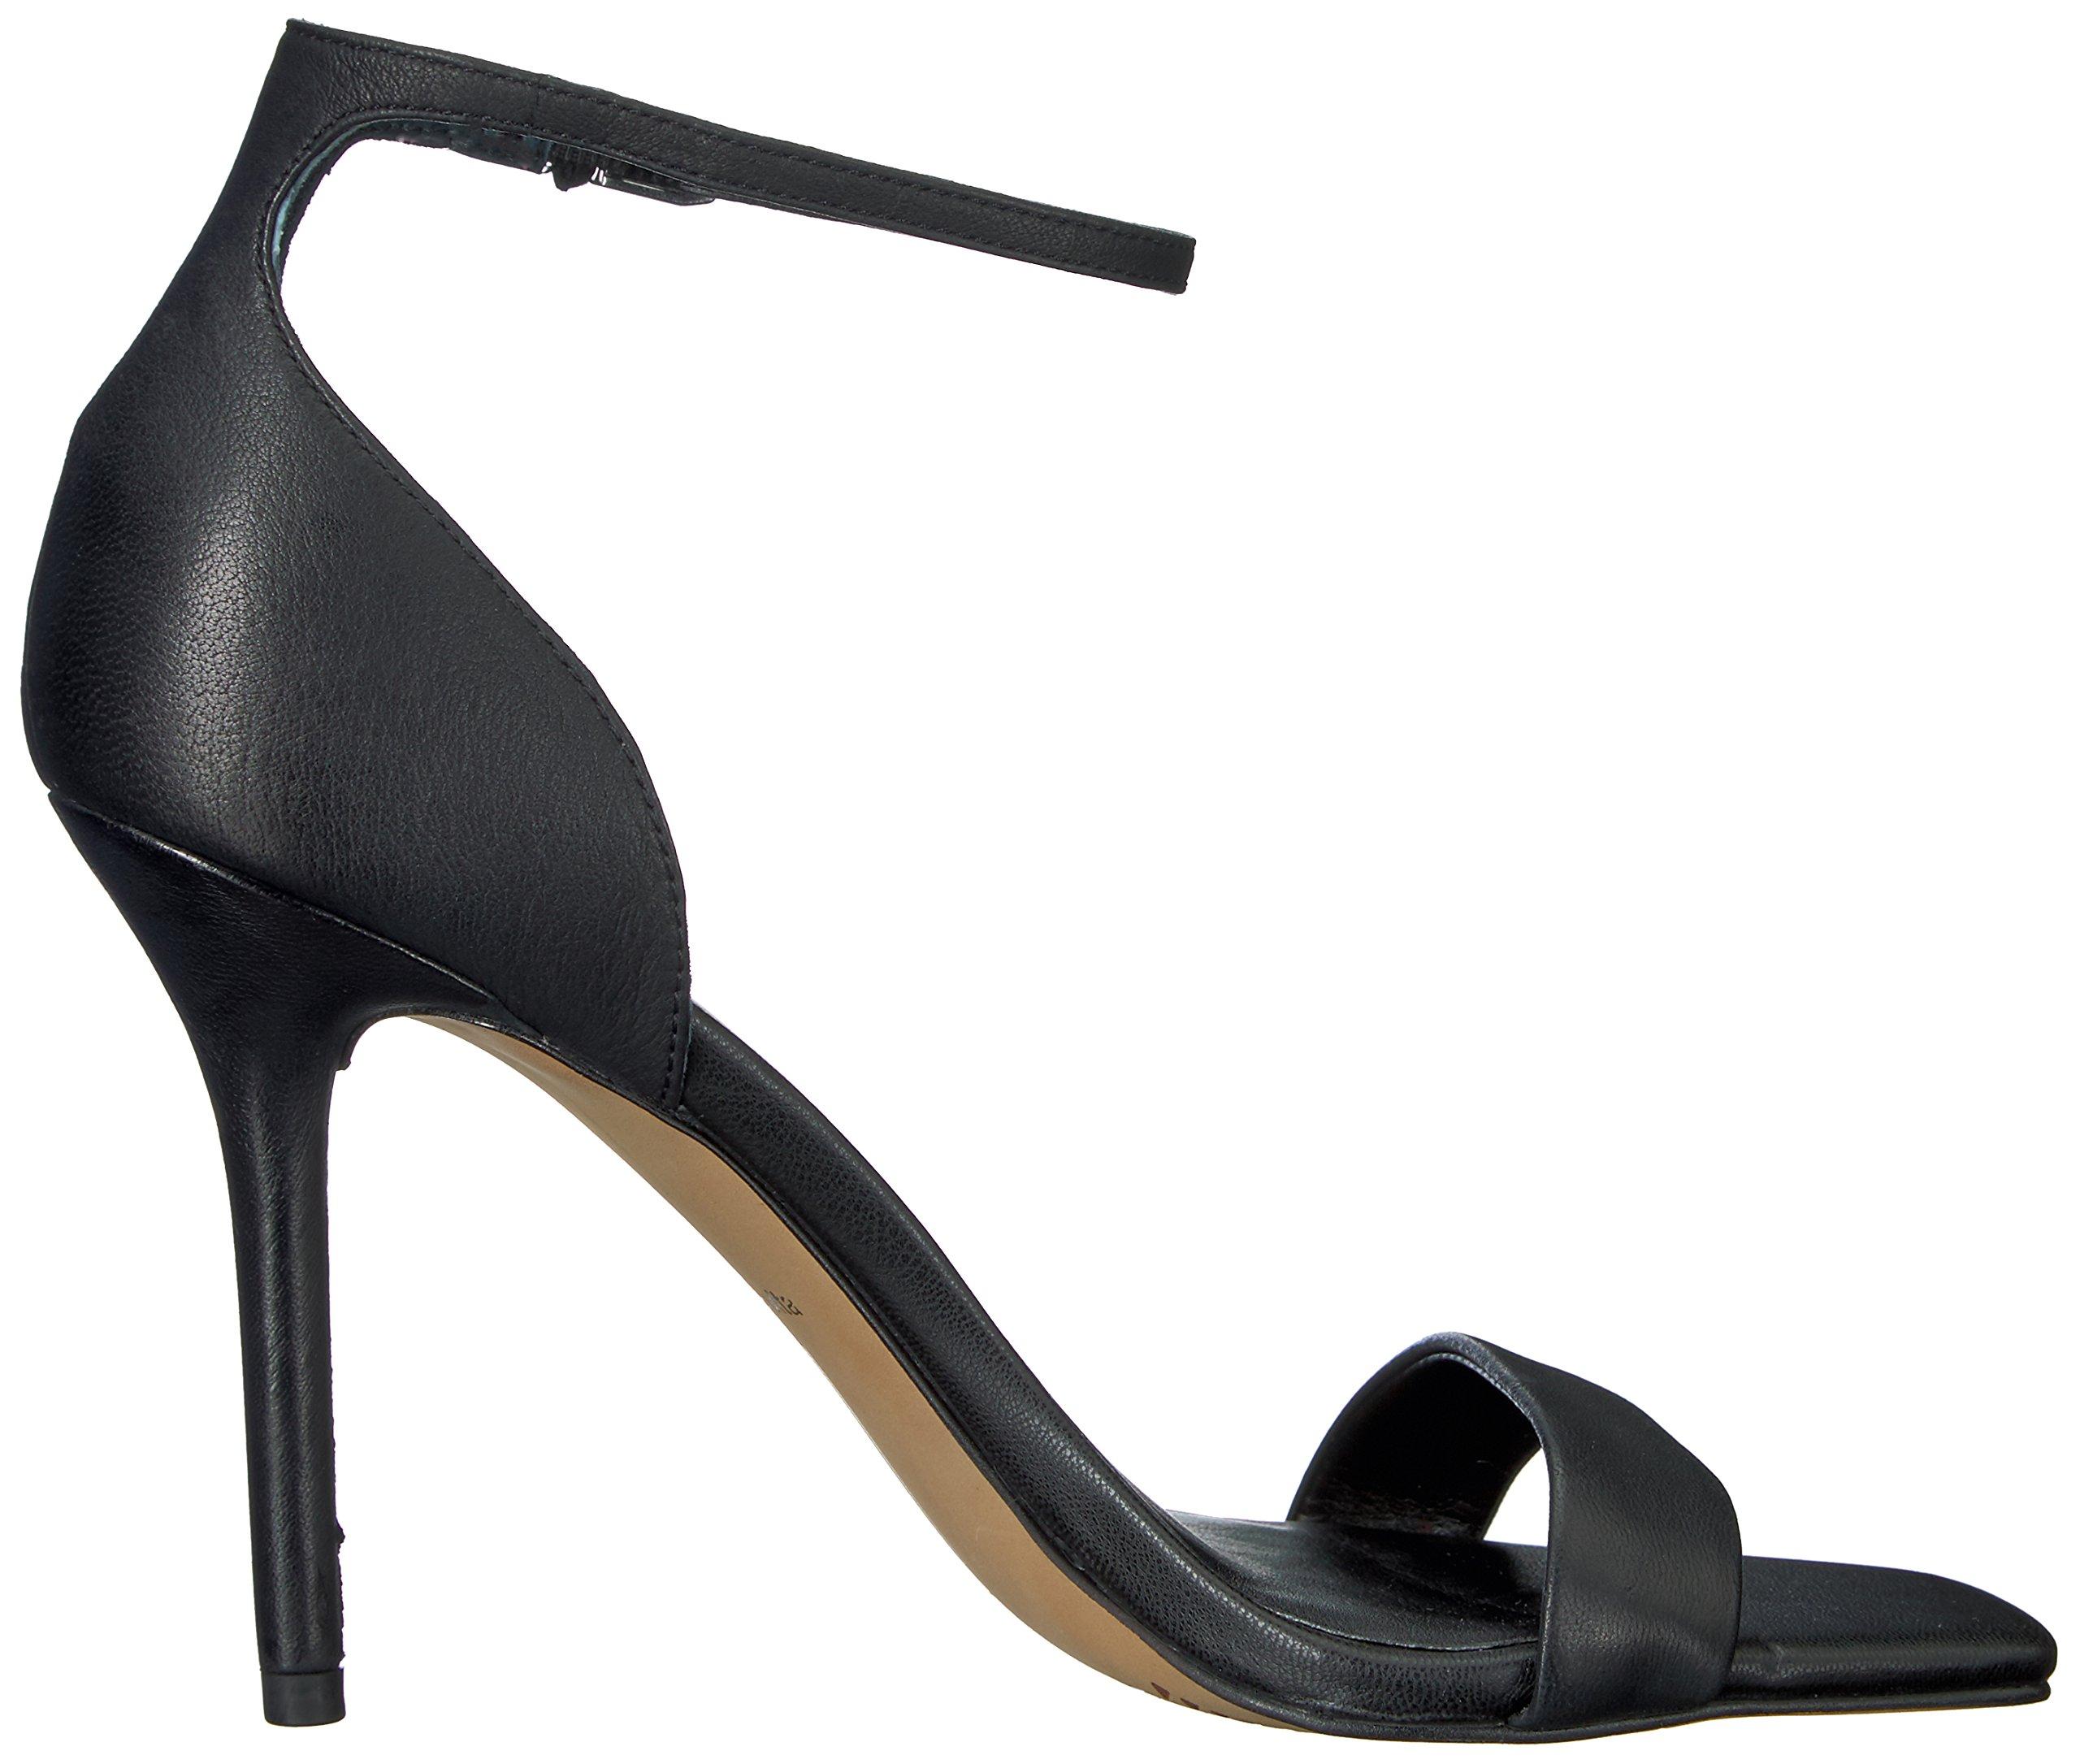 Dolce Vita Women's Halo Heeled Sandal, Black Leather, 8.5 Medium US by Dolce Vita (Image #7)